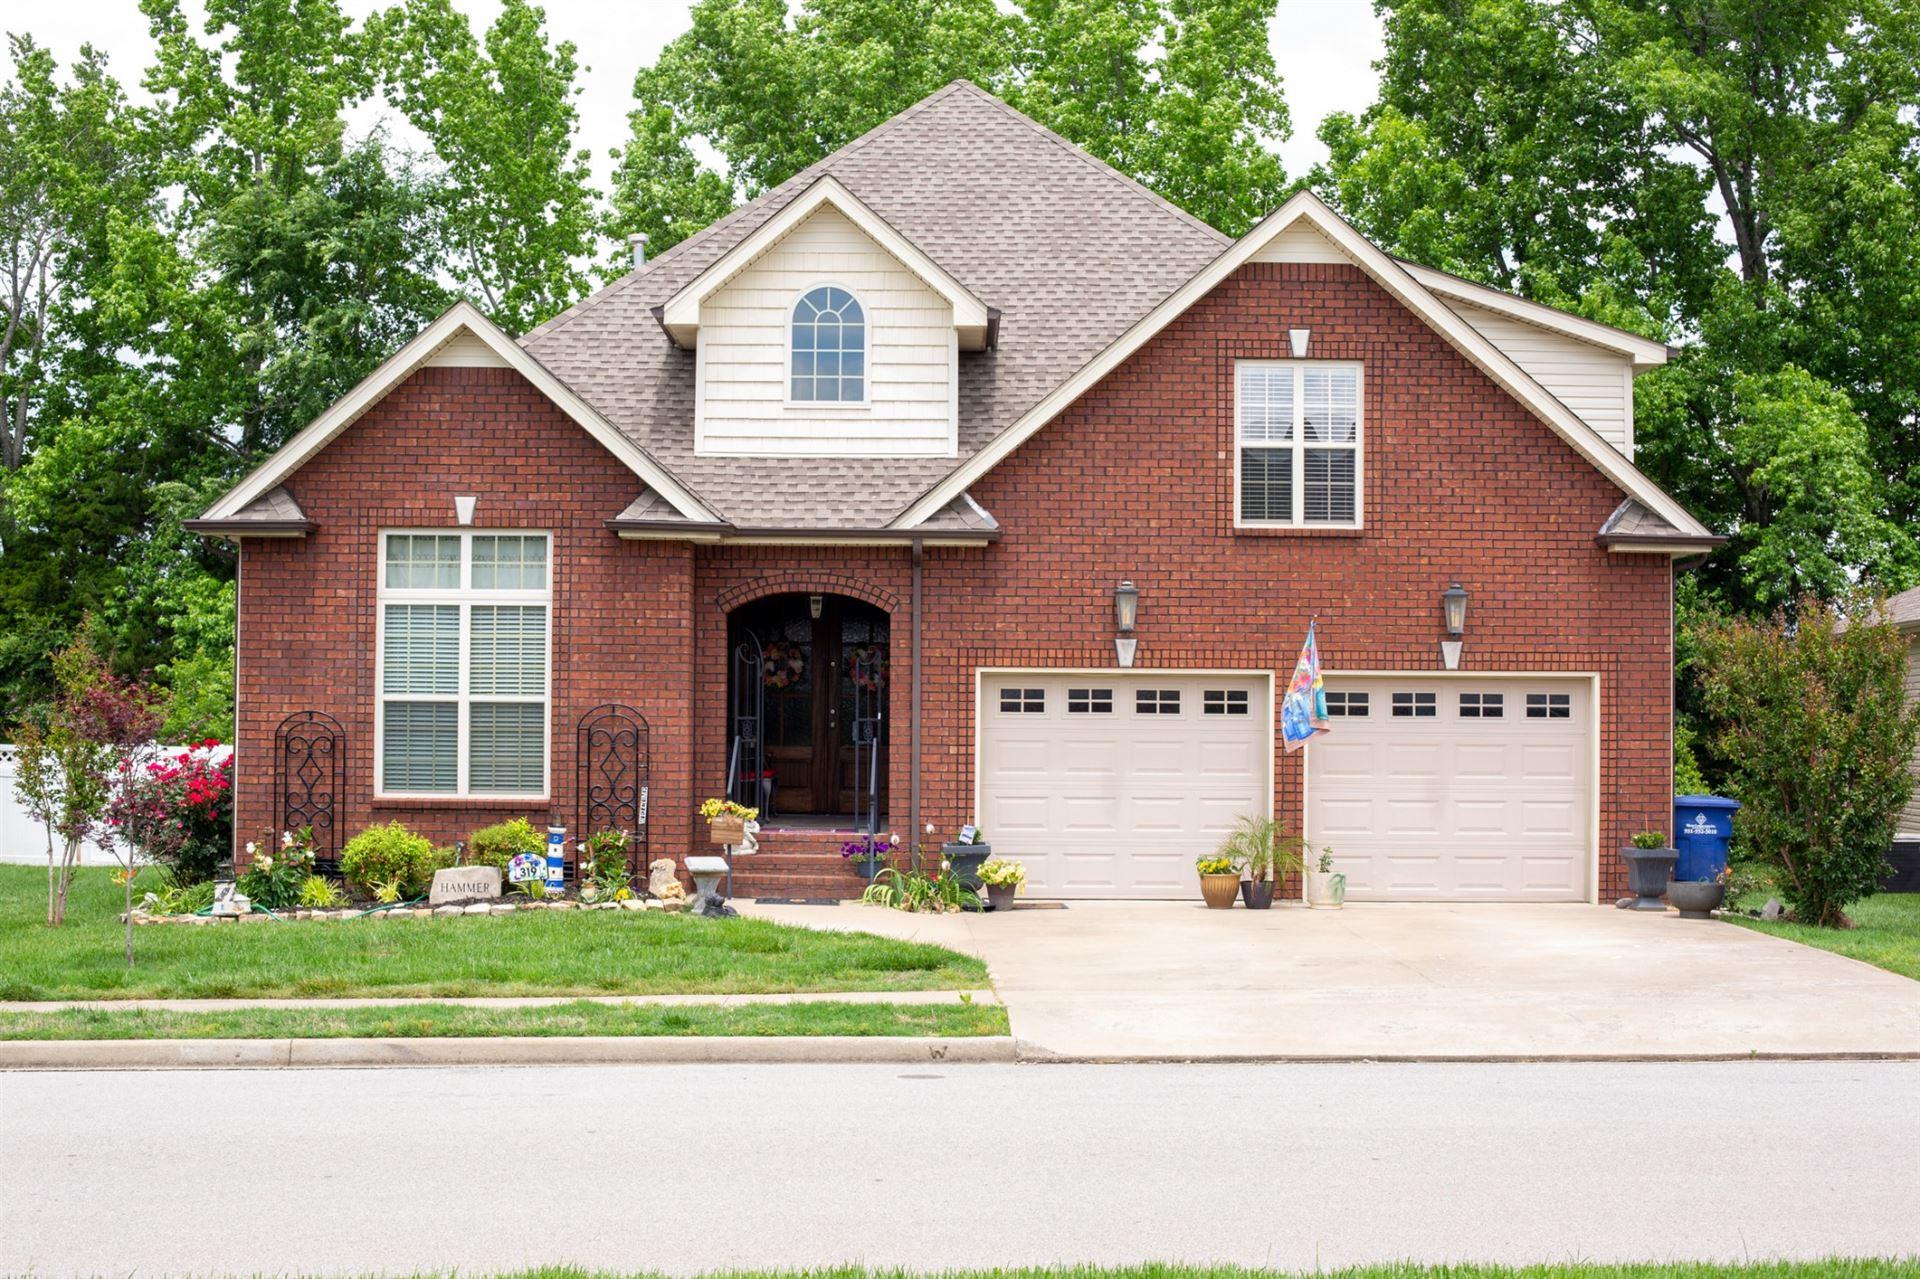 319 Turnberry Cir, Clarksville, TN 37043 - MLS#: 2167308